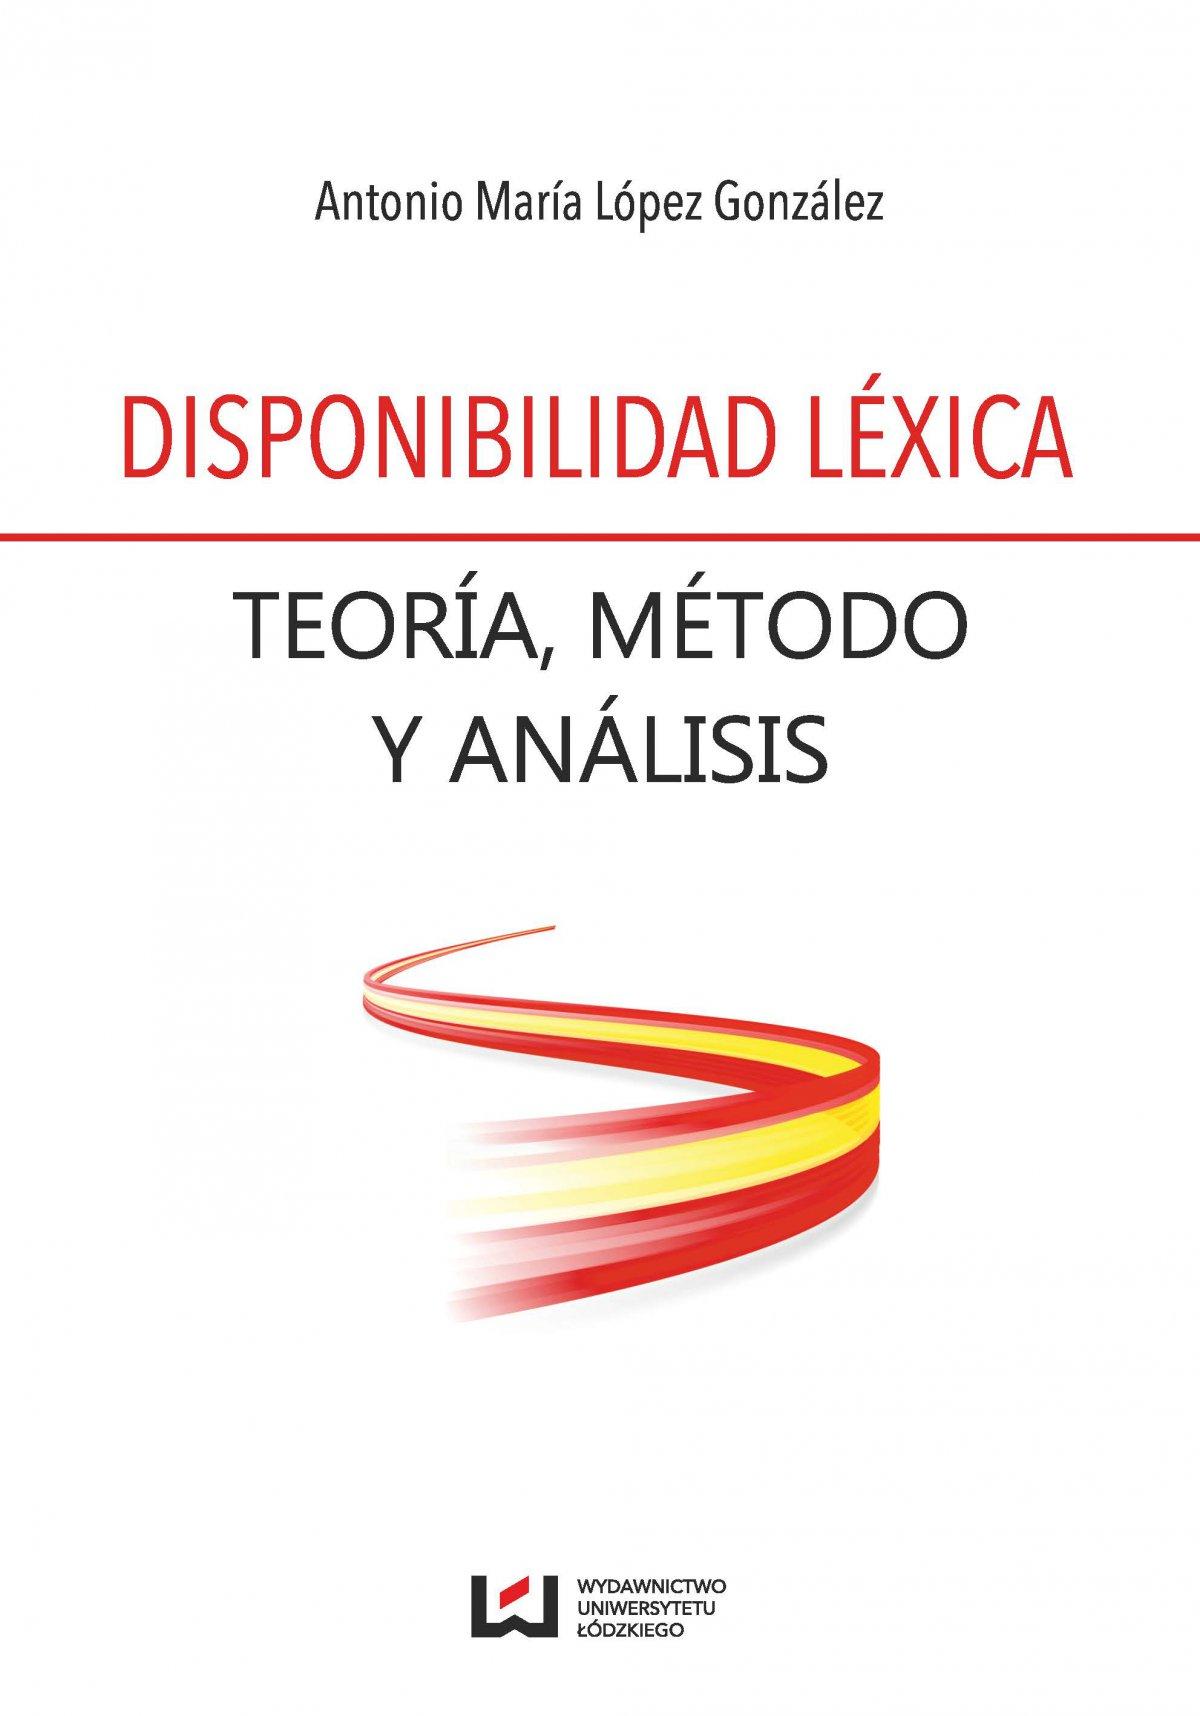 Disponibilidad léexica. Teoria, metodo y analisis - Ebook (Książka PDF) do pobrania w formacie PDF